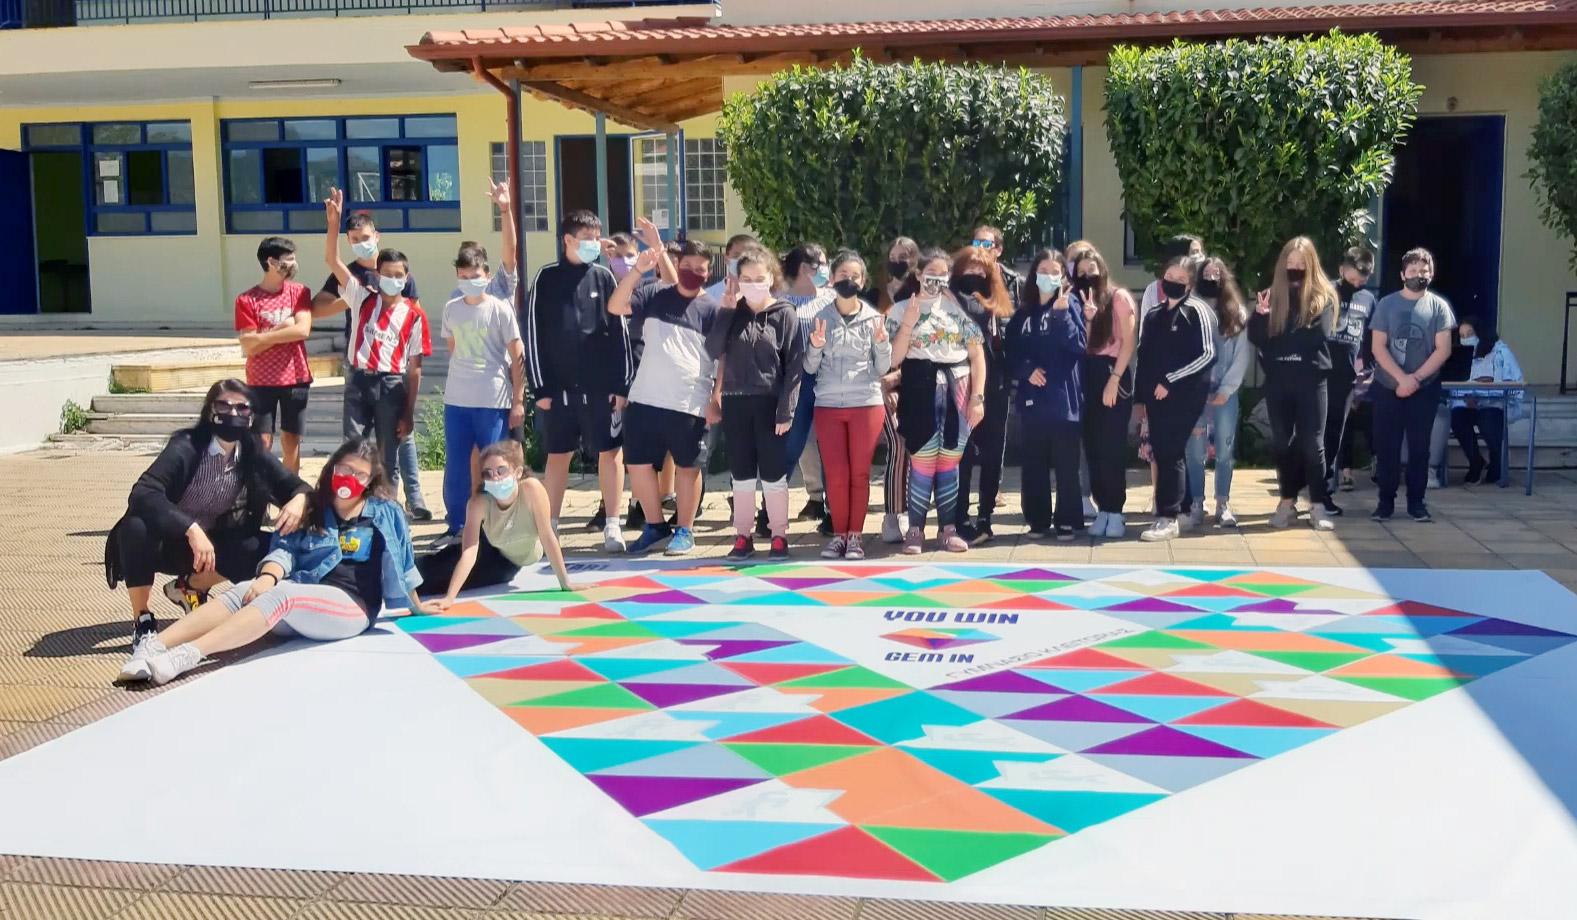 Read more about the article 204 μαθητές συμμετείχαν στην πιλοτική δοκιμή του παιχνιδιού που αναπτύχθηκε στο πλαίσιο του Ευρωπαϊκού προγράμματος GEM IN!